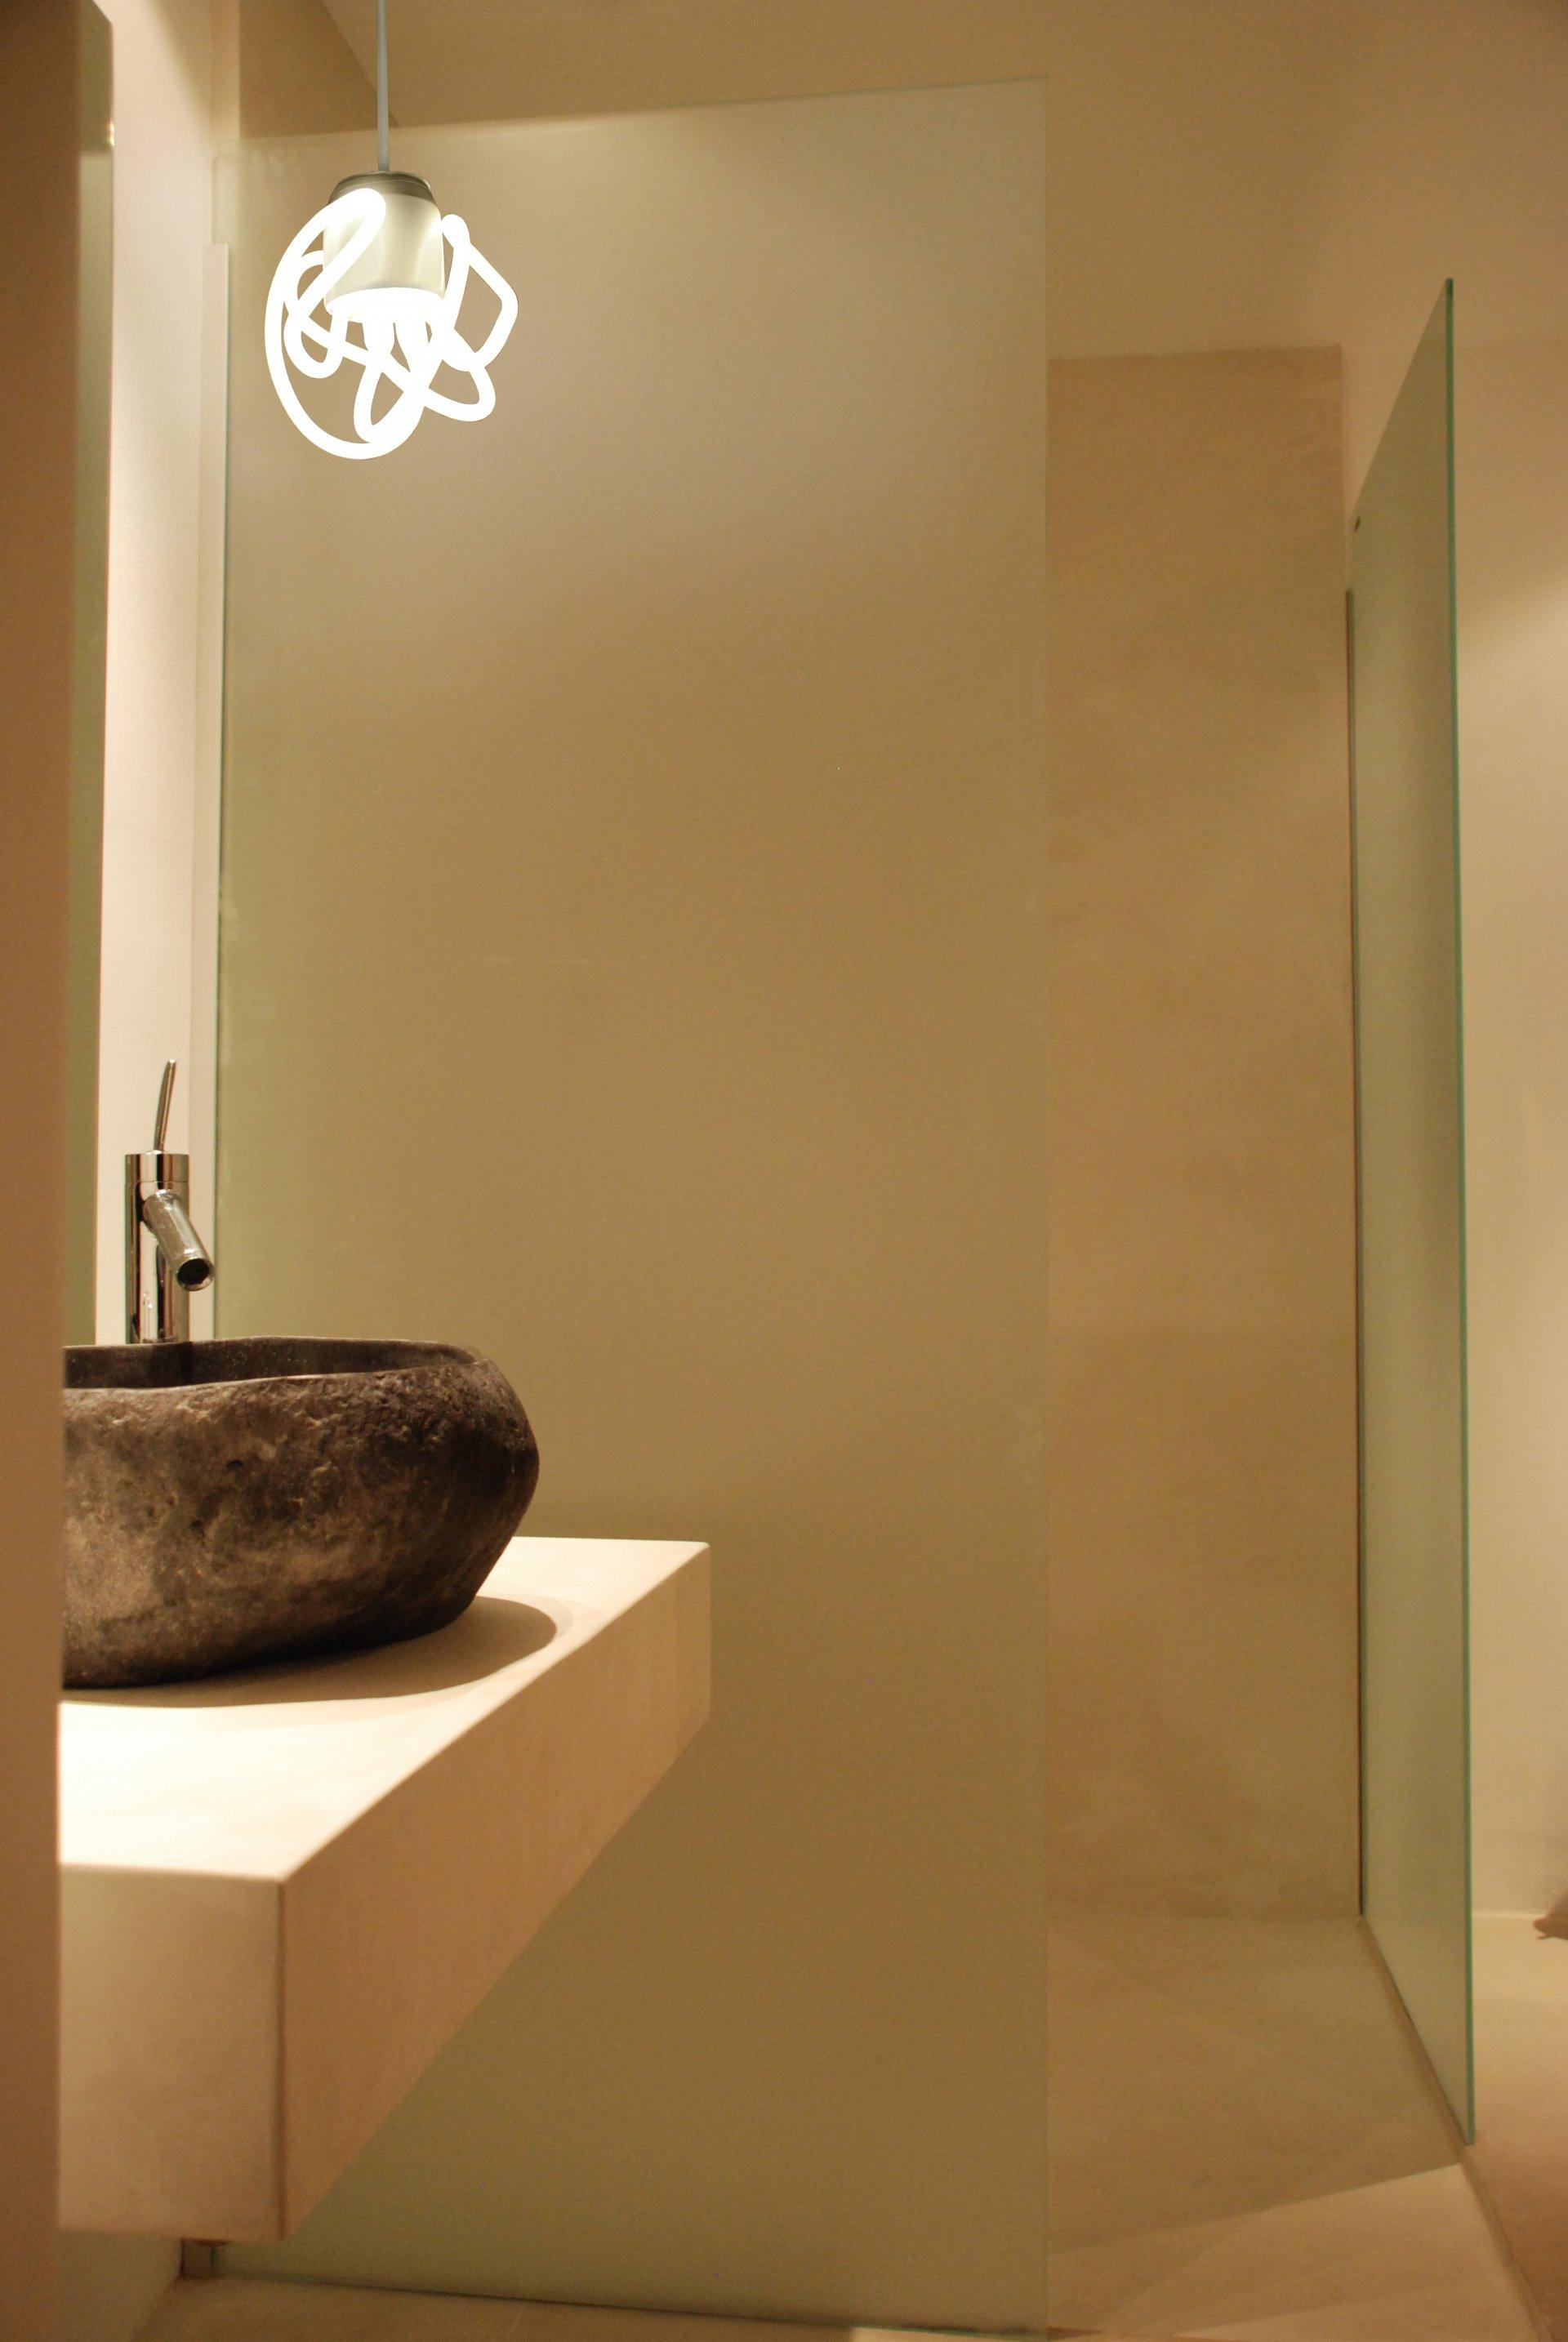 plumen-prototype-3-bathroom Prototypes (3 different neons) Hulger